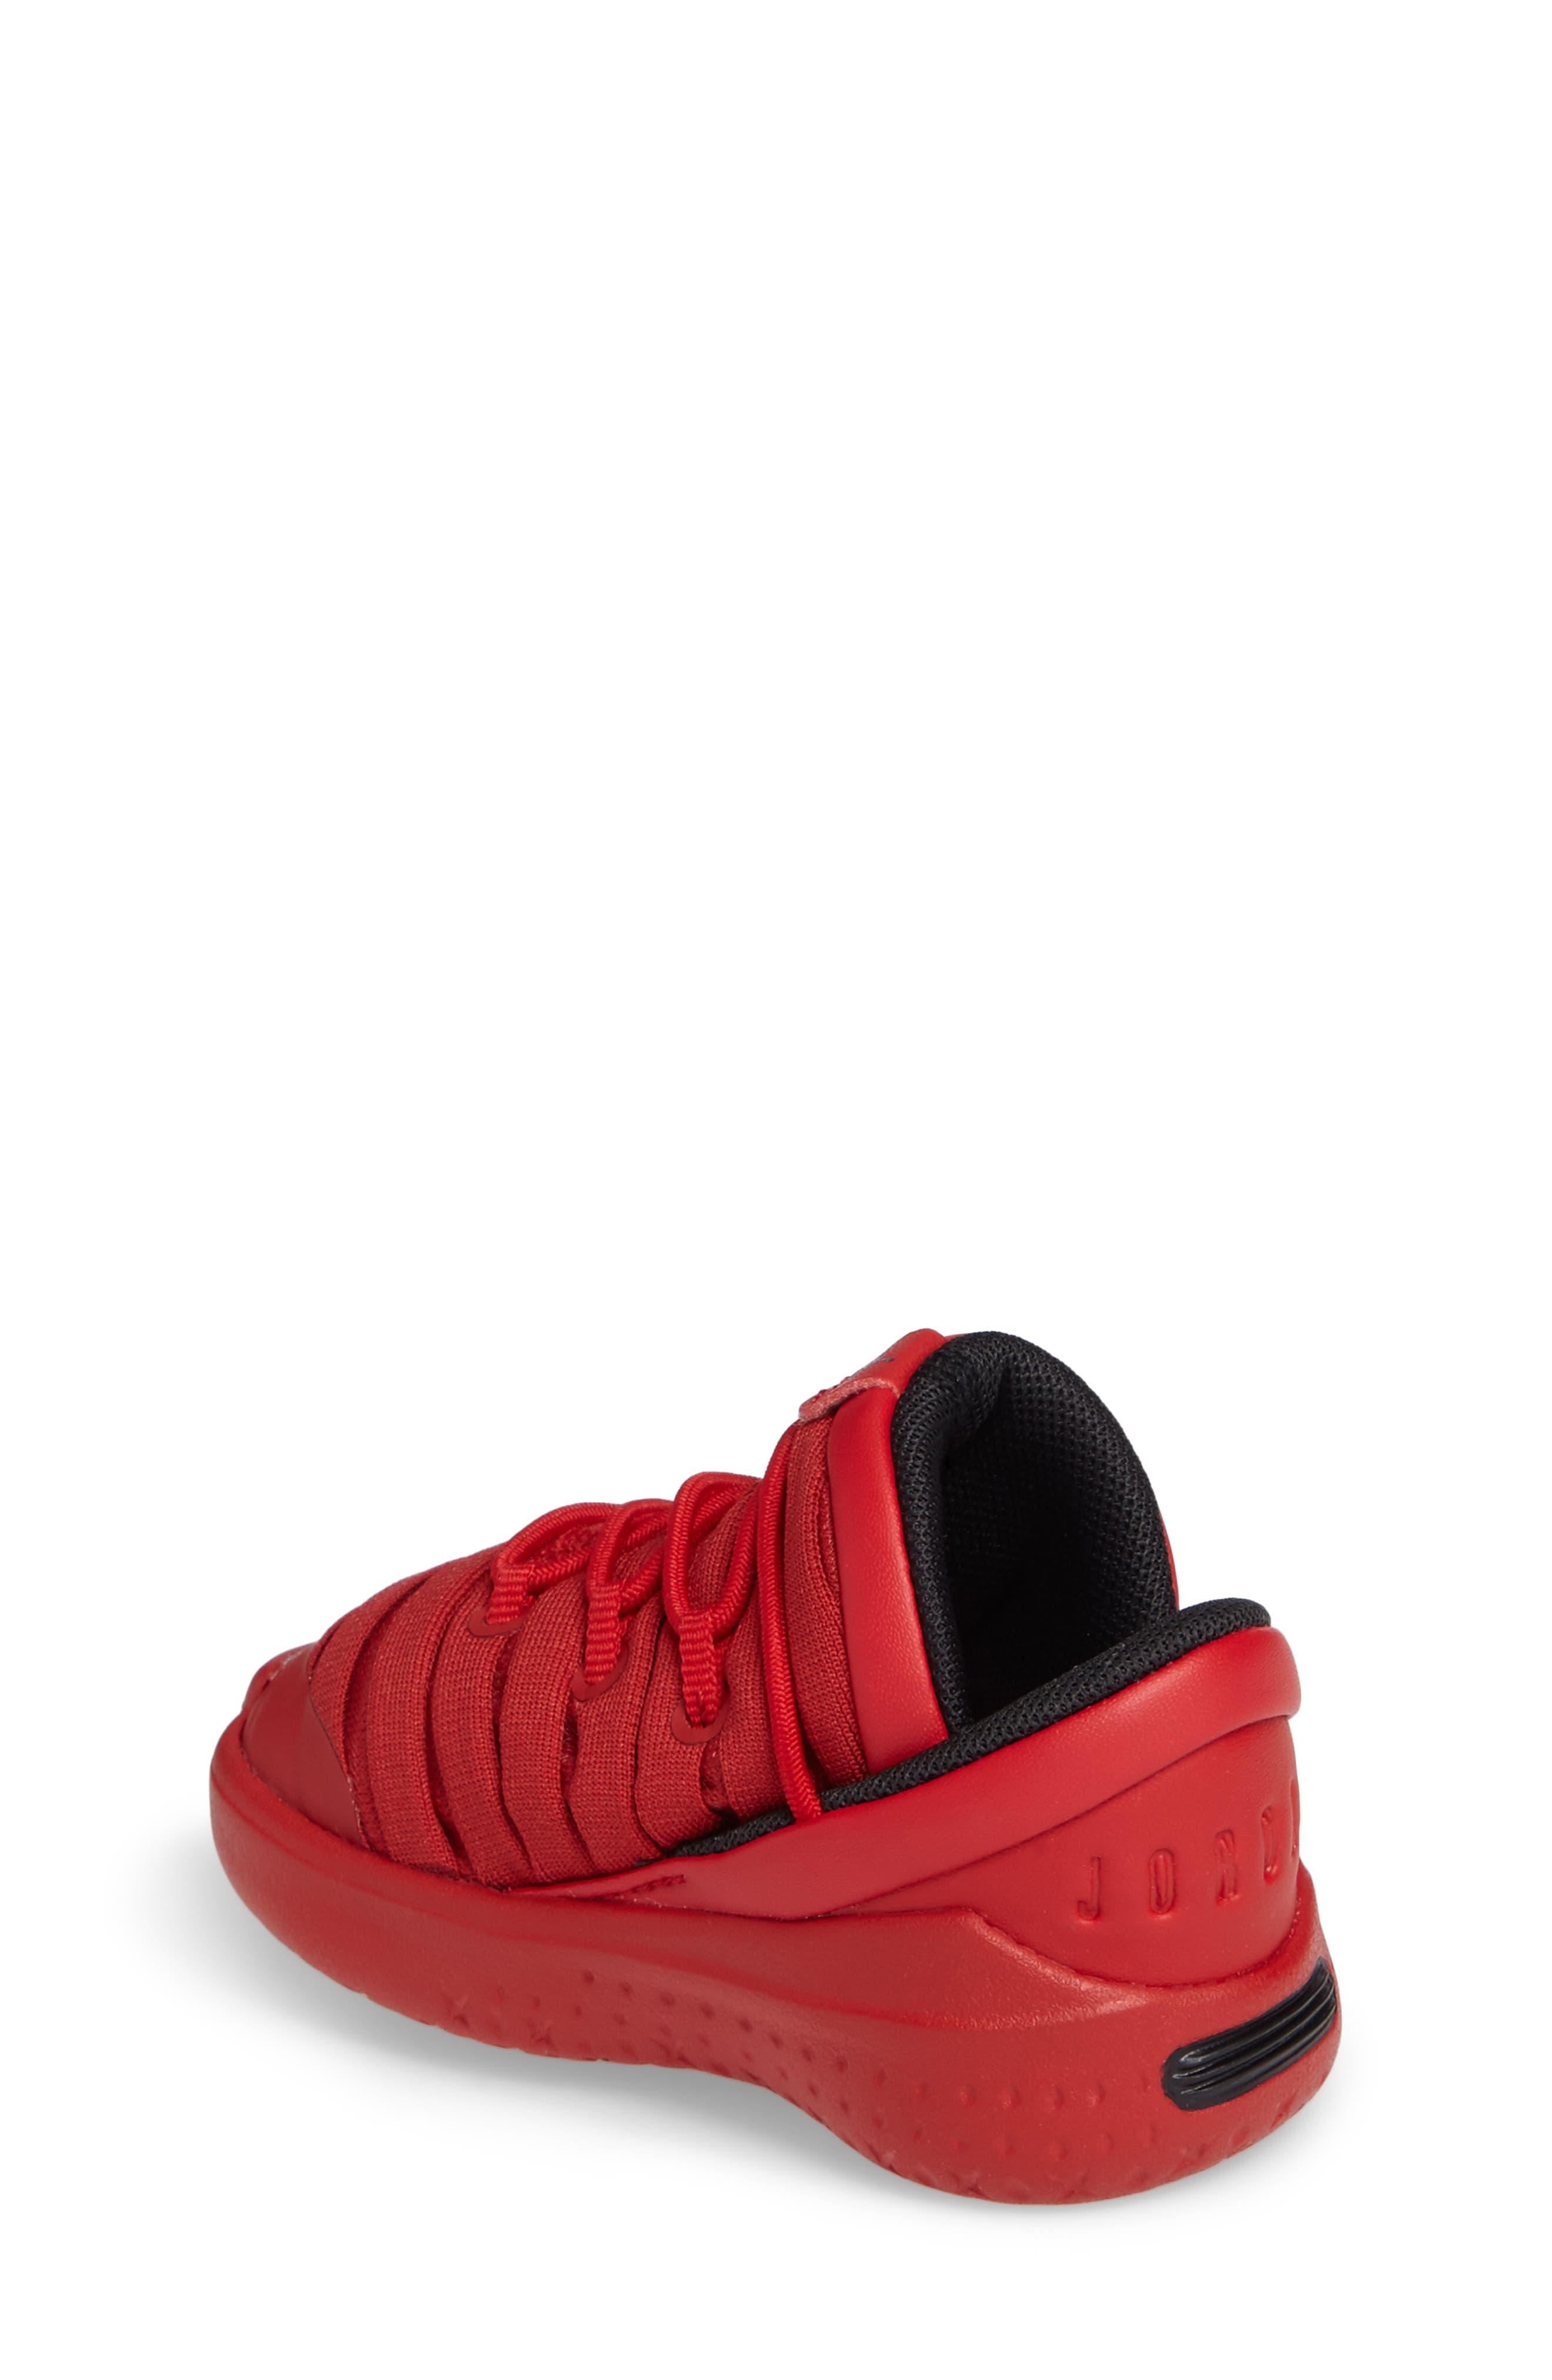 Flight Luxe Sneaker,                             Alternate thumbnail 4, color,